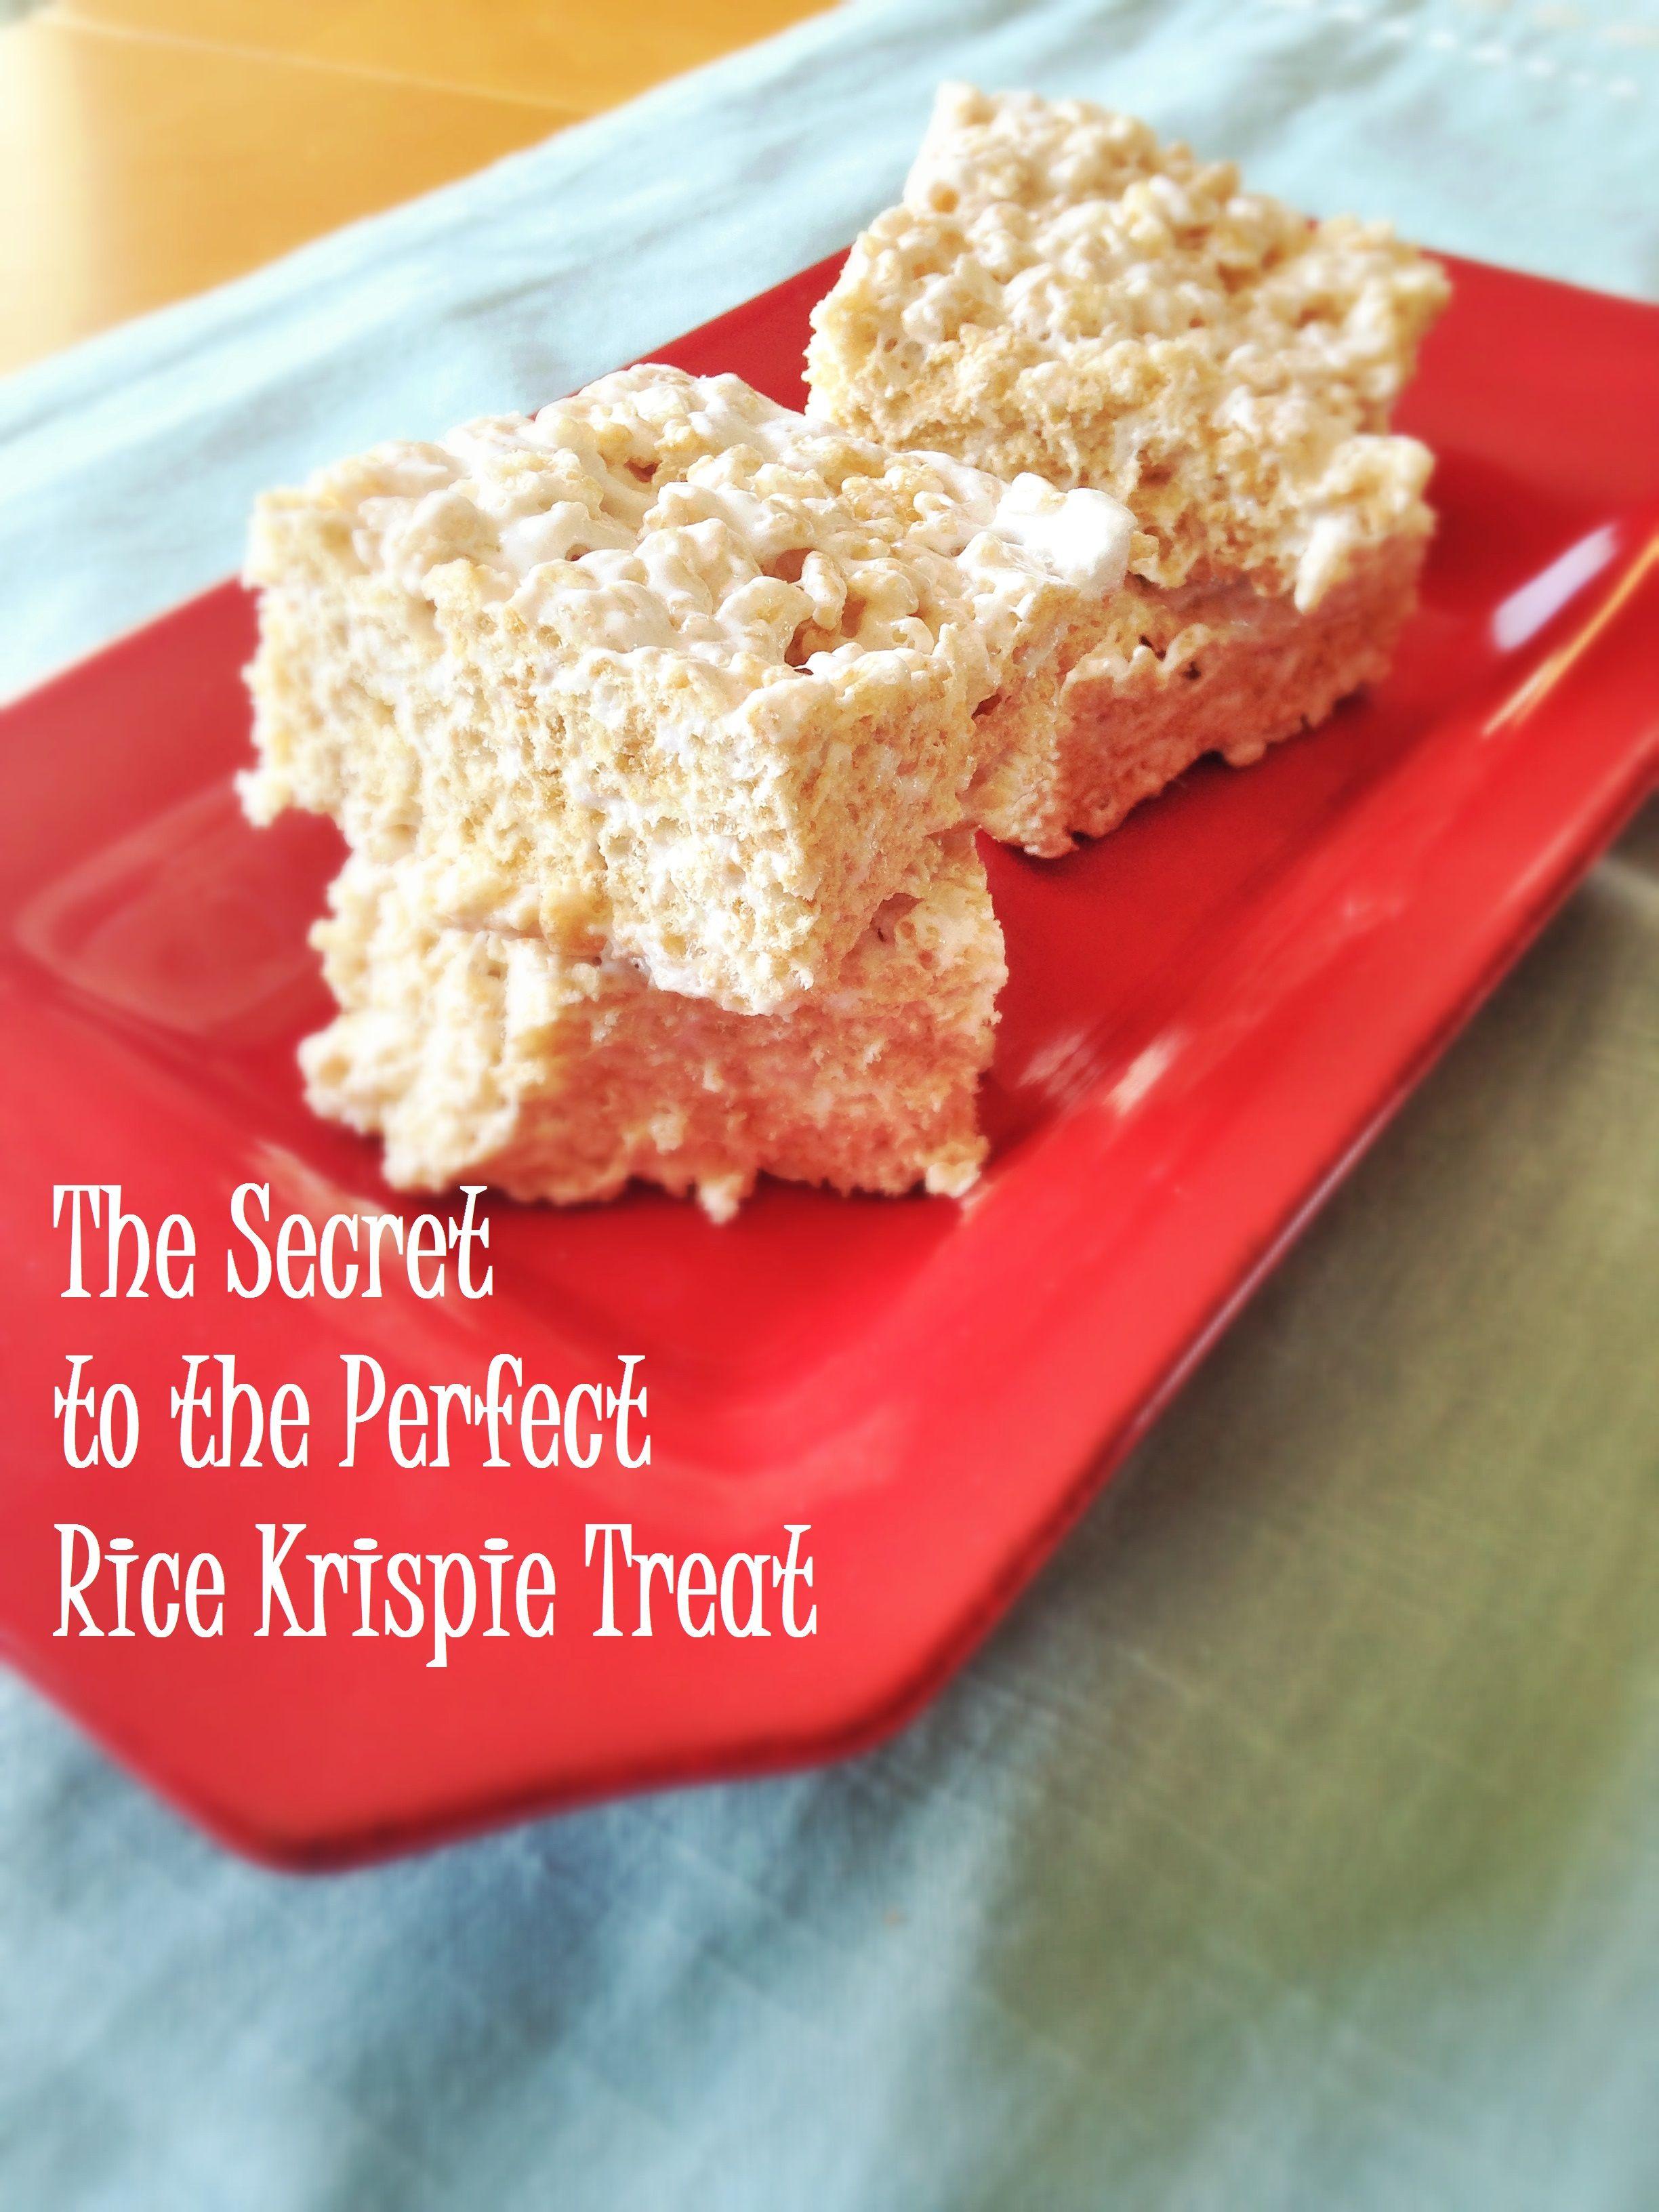 DairyFree Rice Krispie Recipe Made with canola oil